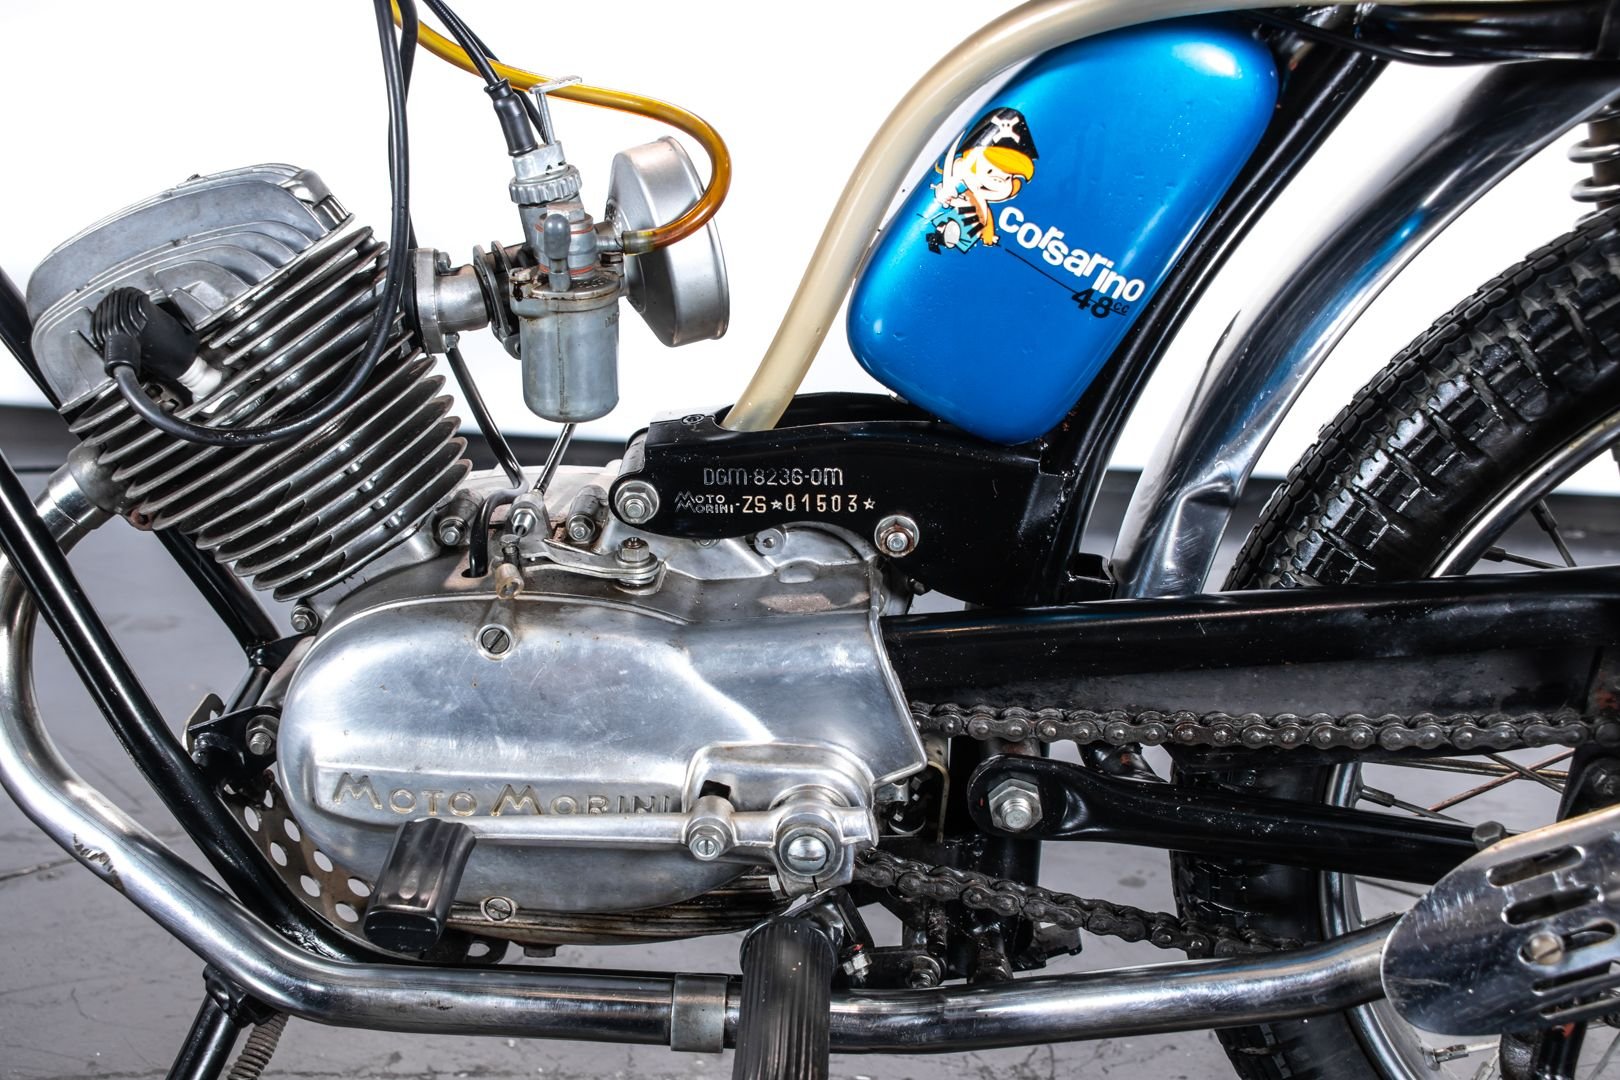 1973 Moto Morini Corsarino ZT Super Scrambler 77679